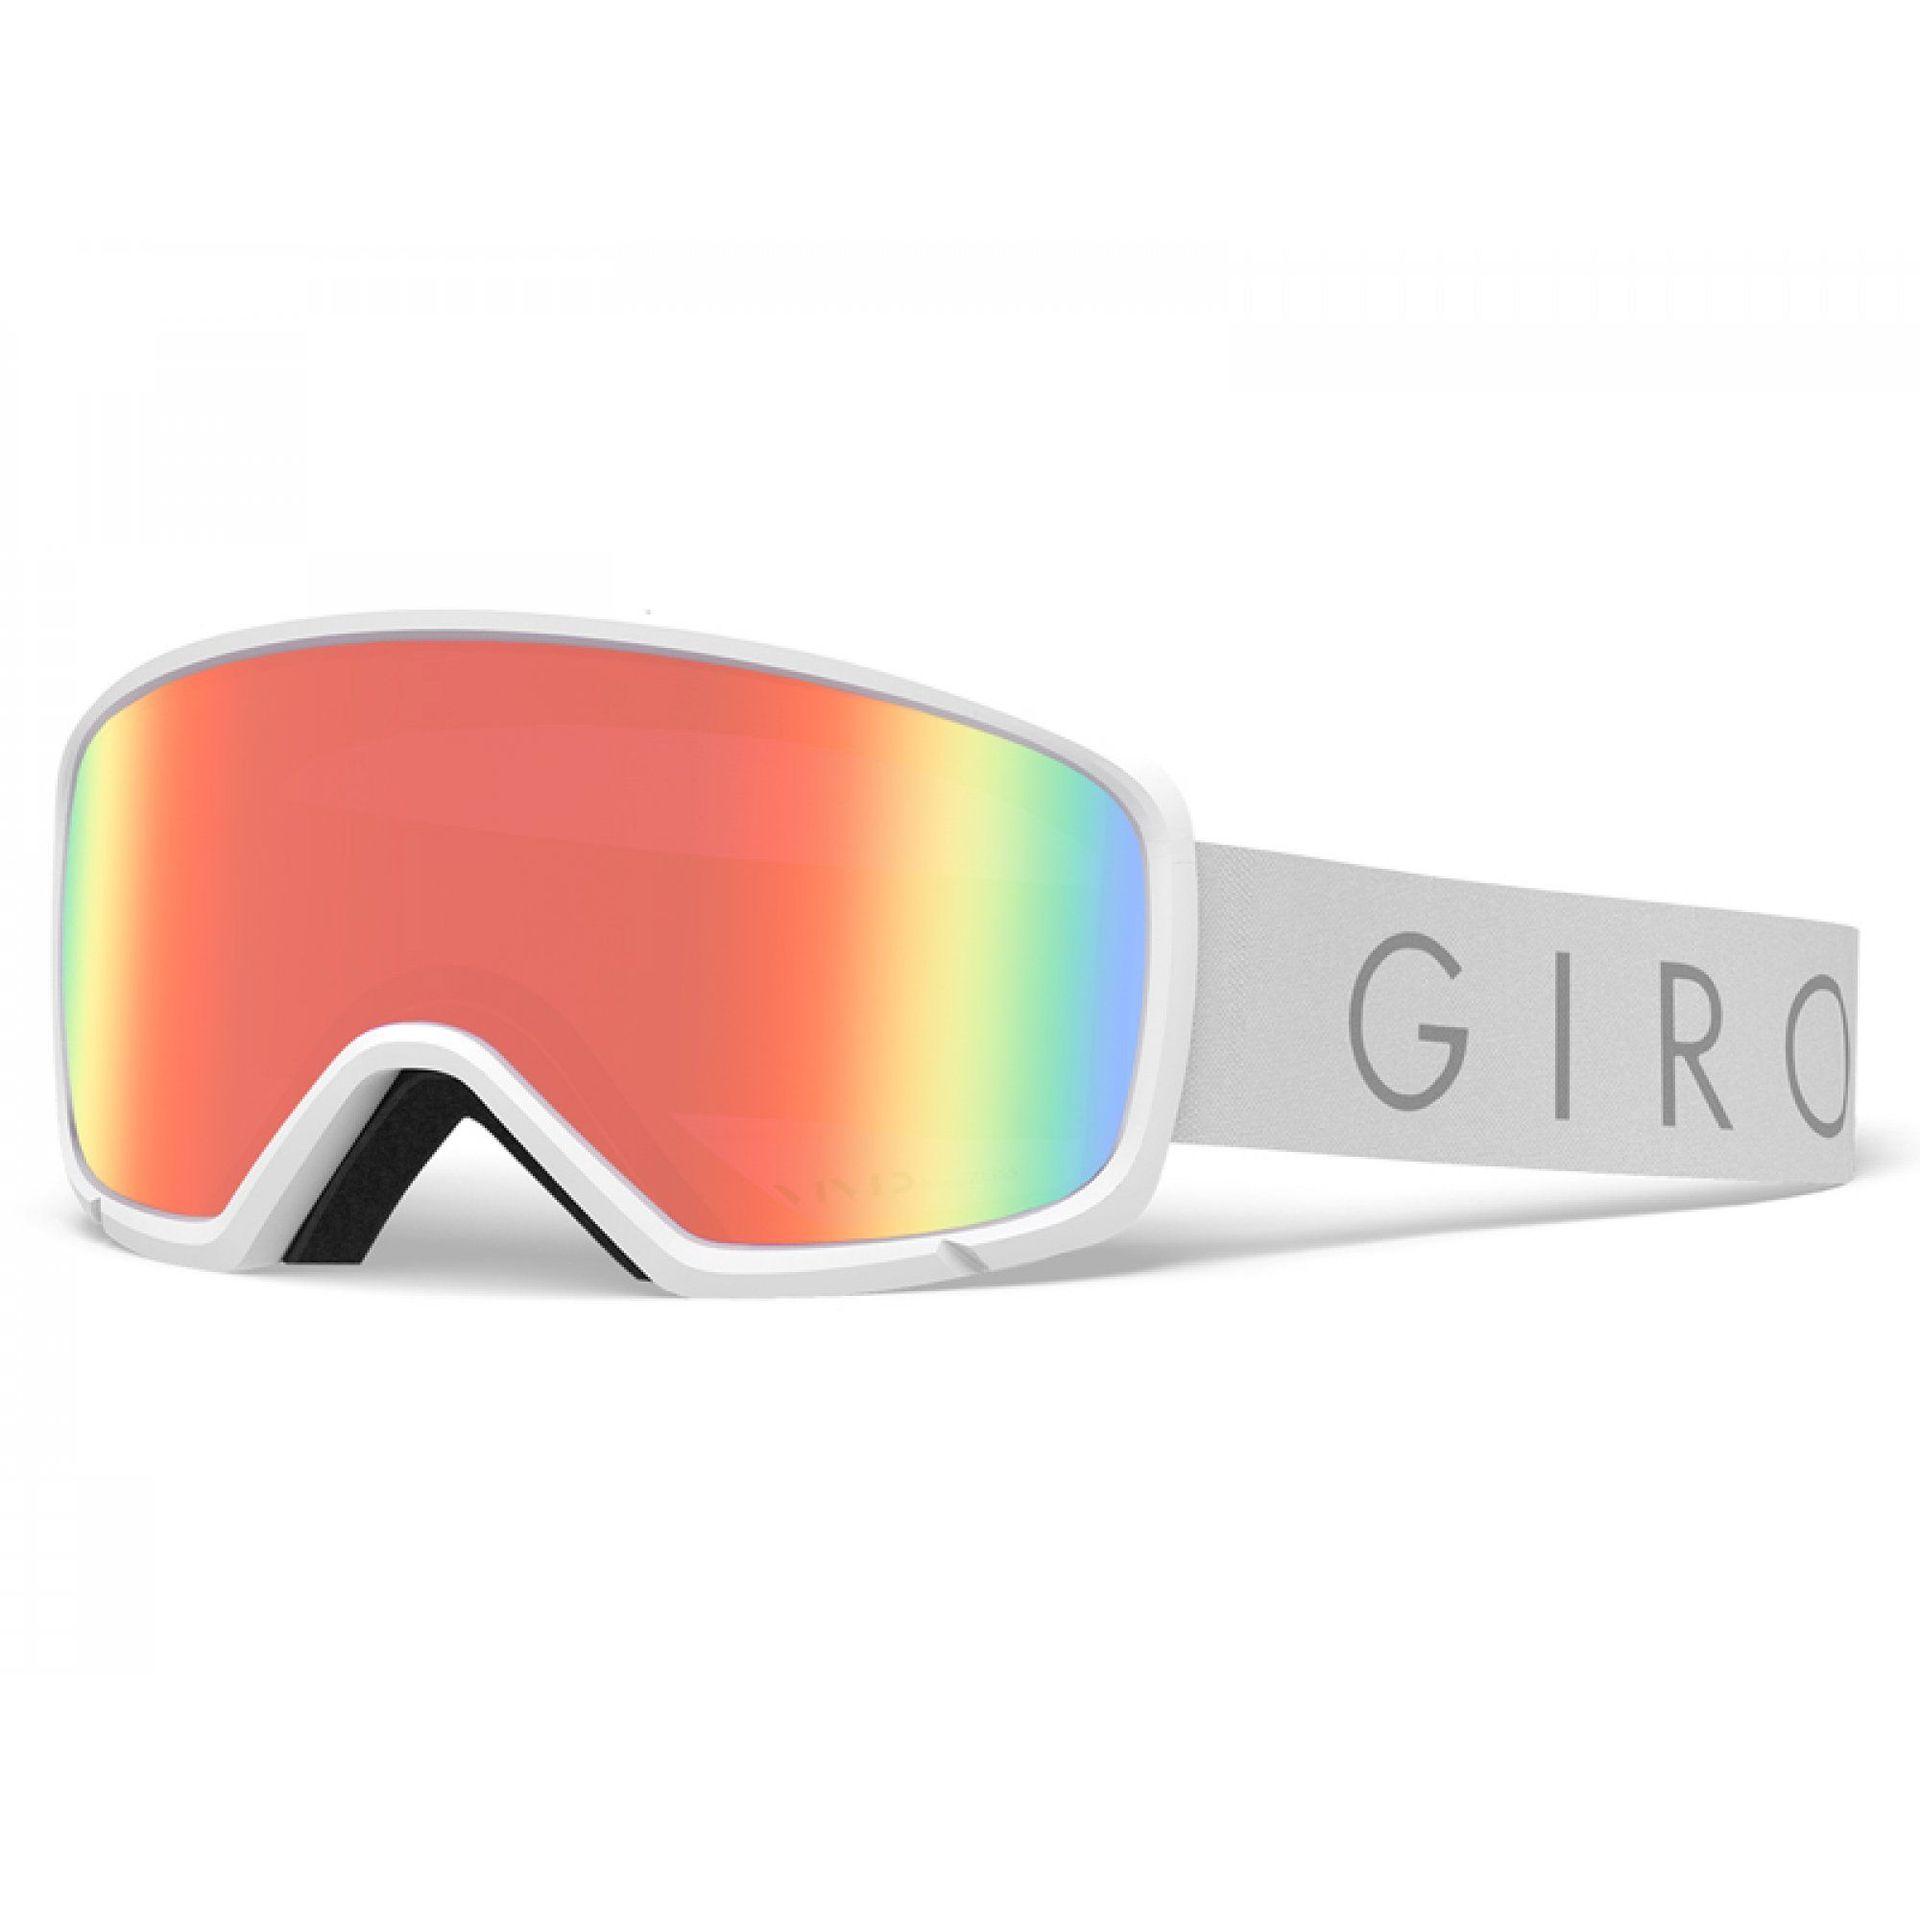 GOGLE GIRO RINGO WHITE CORE LIGHT|INFRARED 1